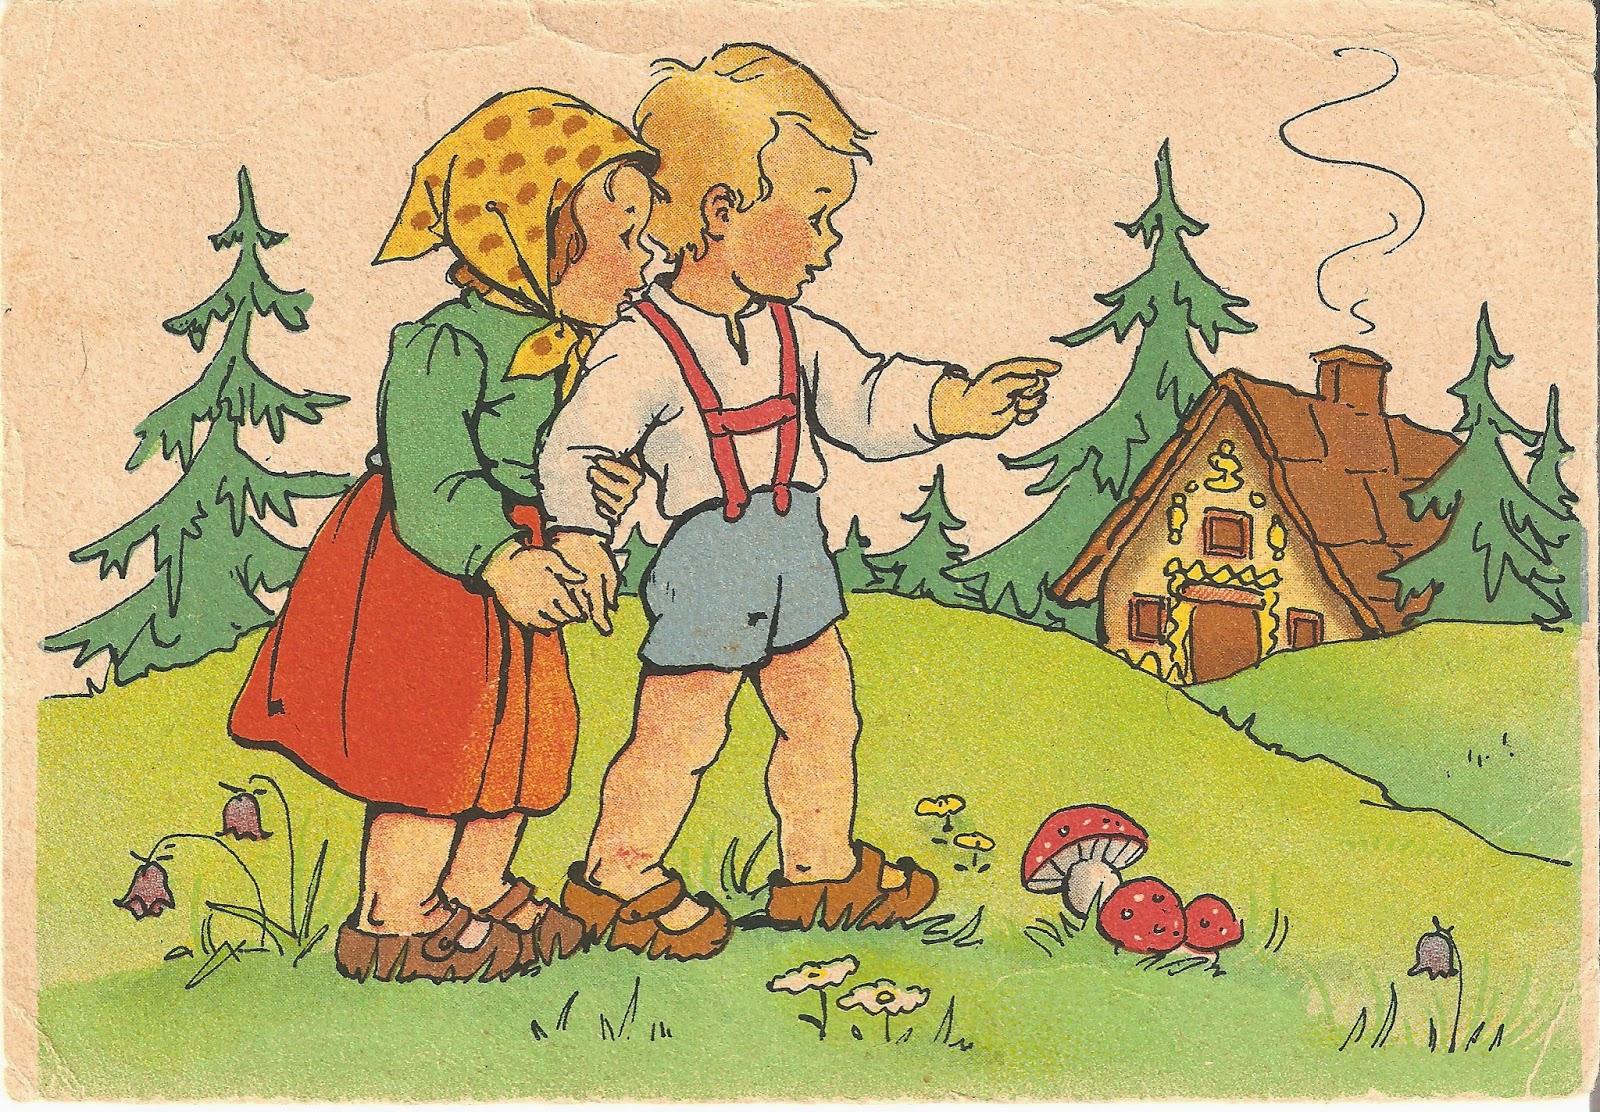 Hannu Ja Kerttu Satu